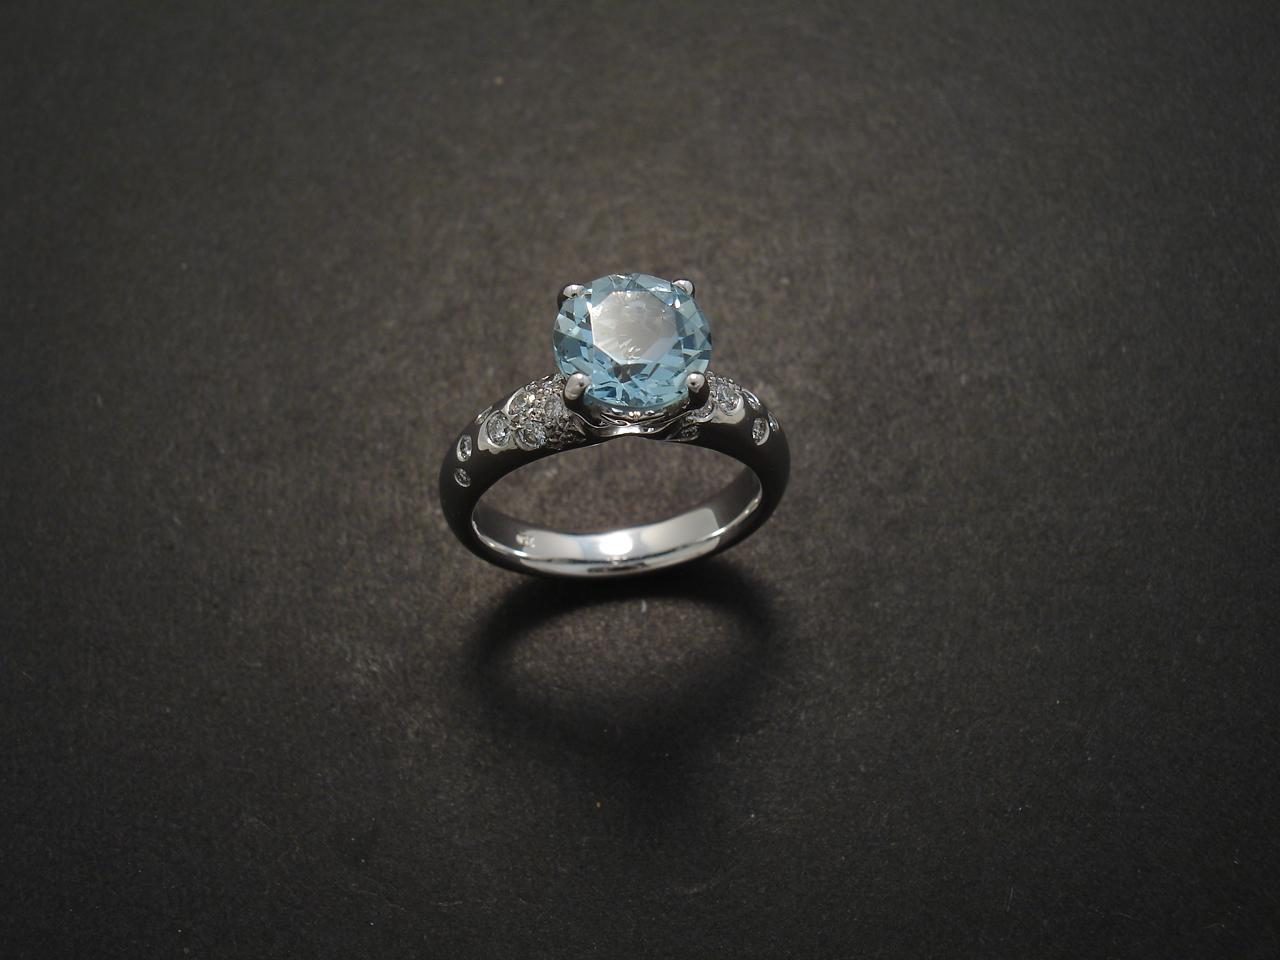 Aquamarine Engagement Ring Christopher William Sydney